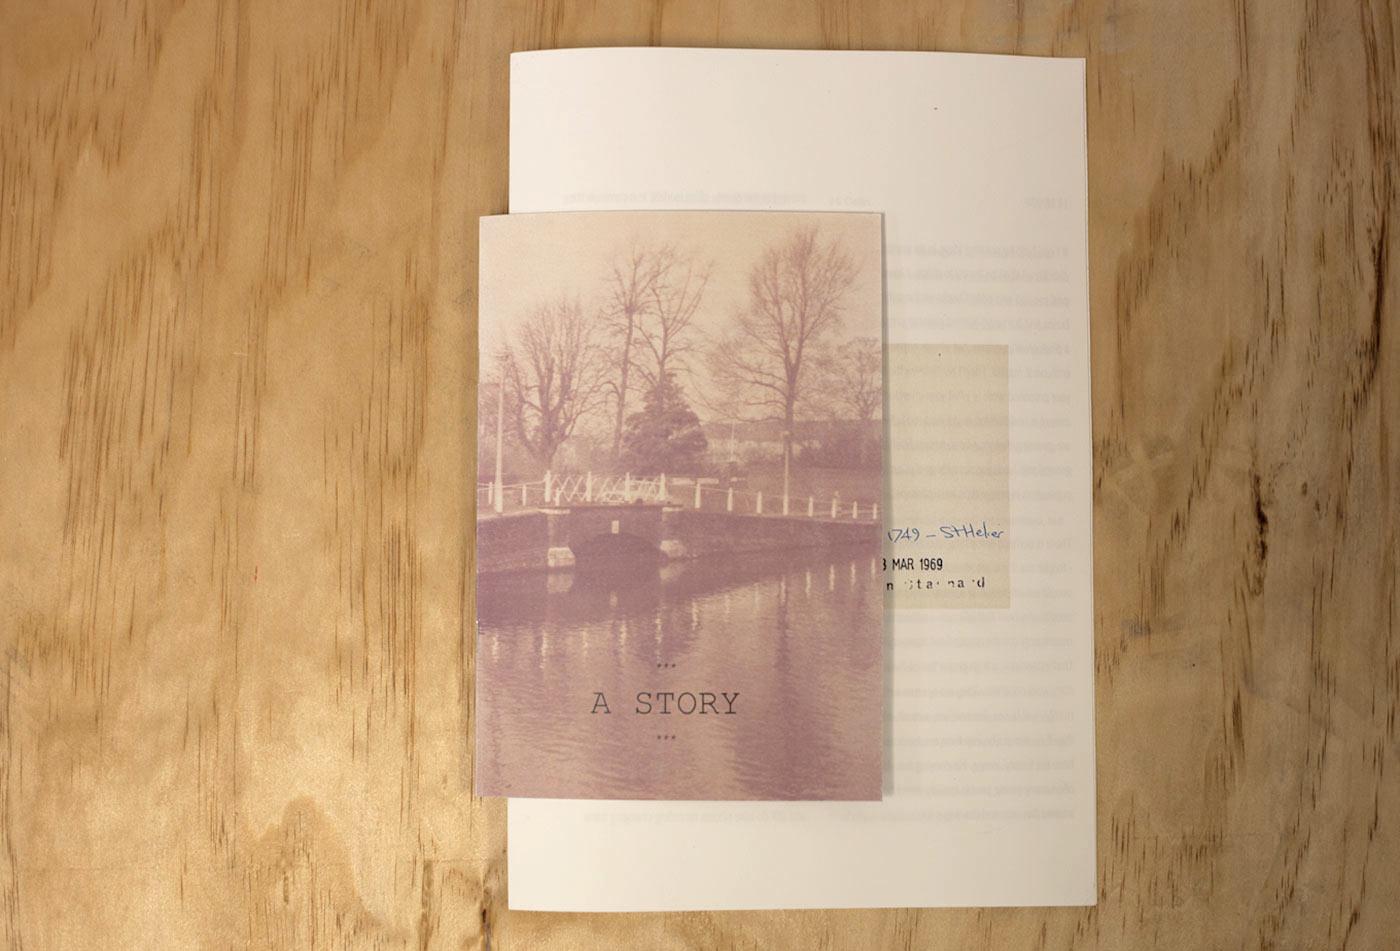 paula-roush-bus-spotting-photobook-msdm-publications-orphan1-151